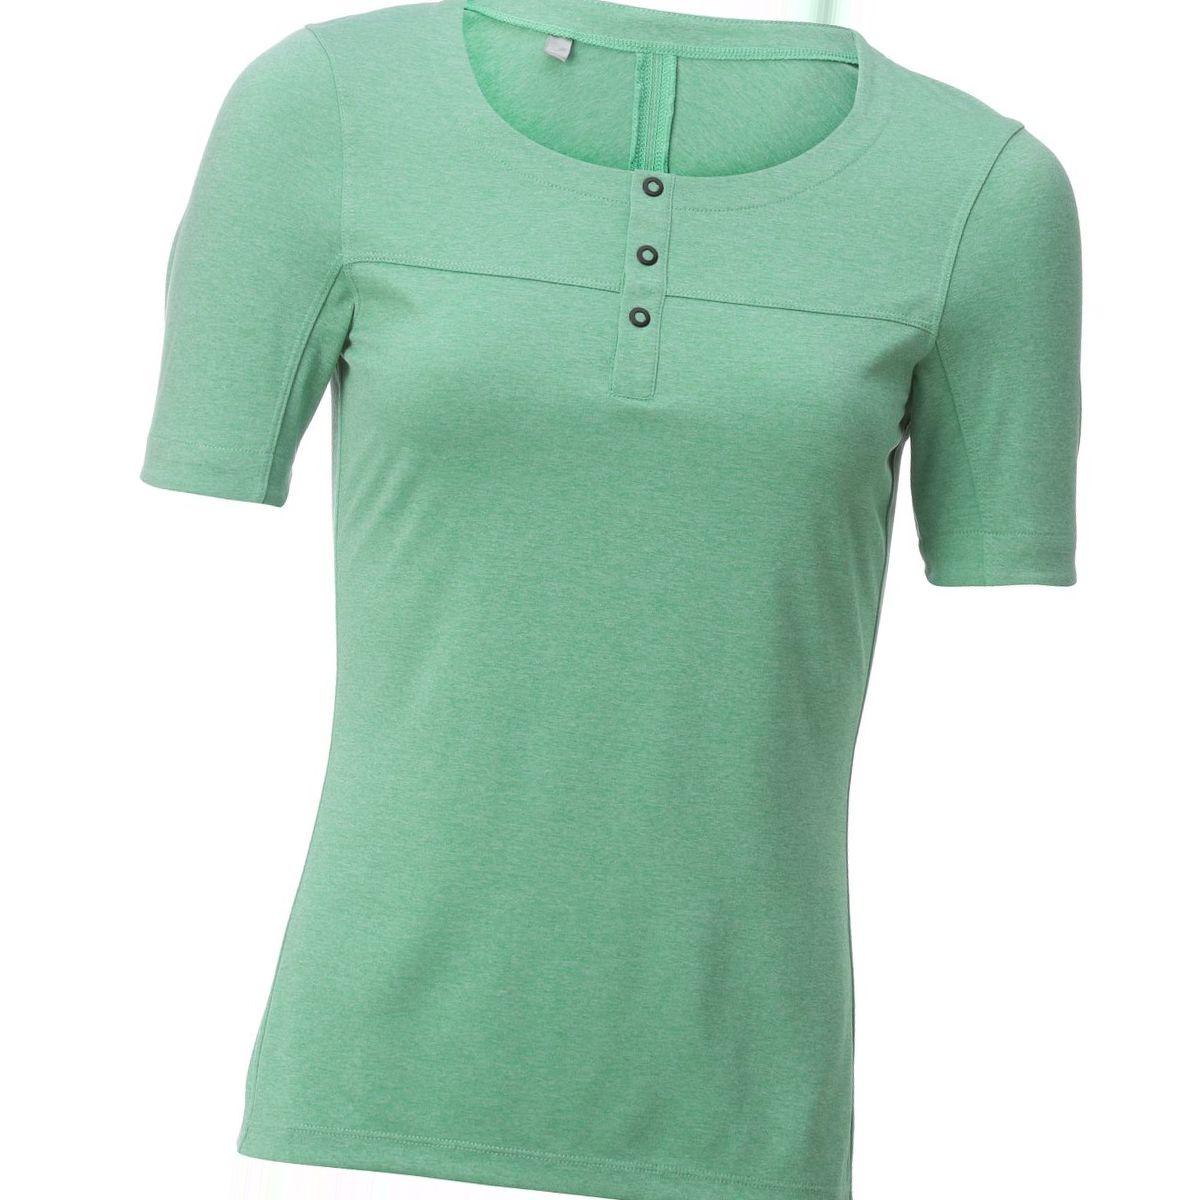 Pearl Izumi Versa Short-Sleeve Henley Jersey - Women's